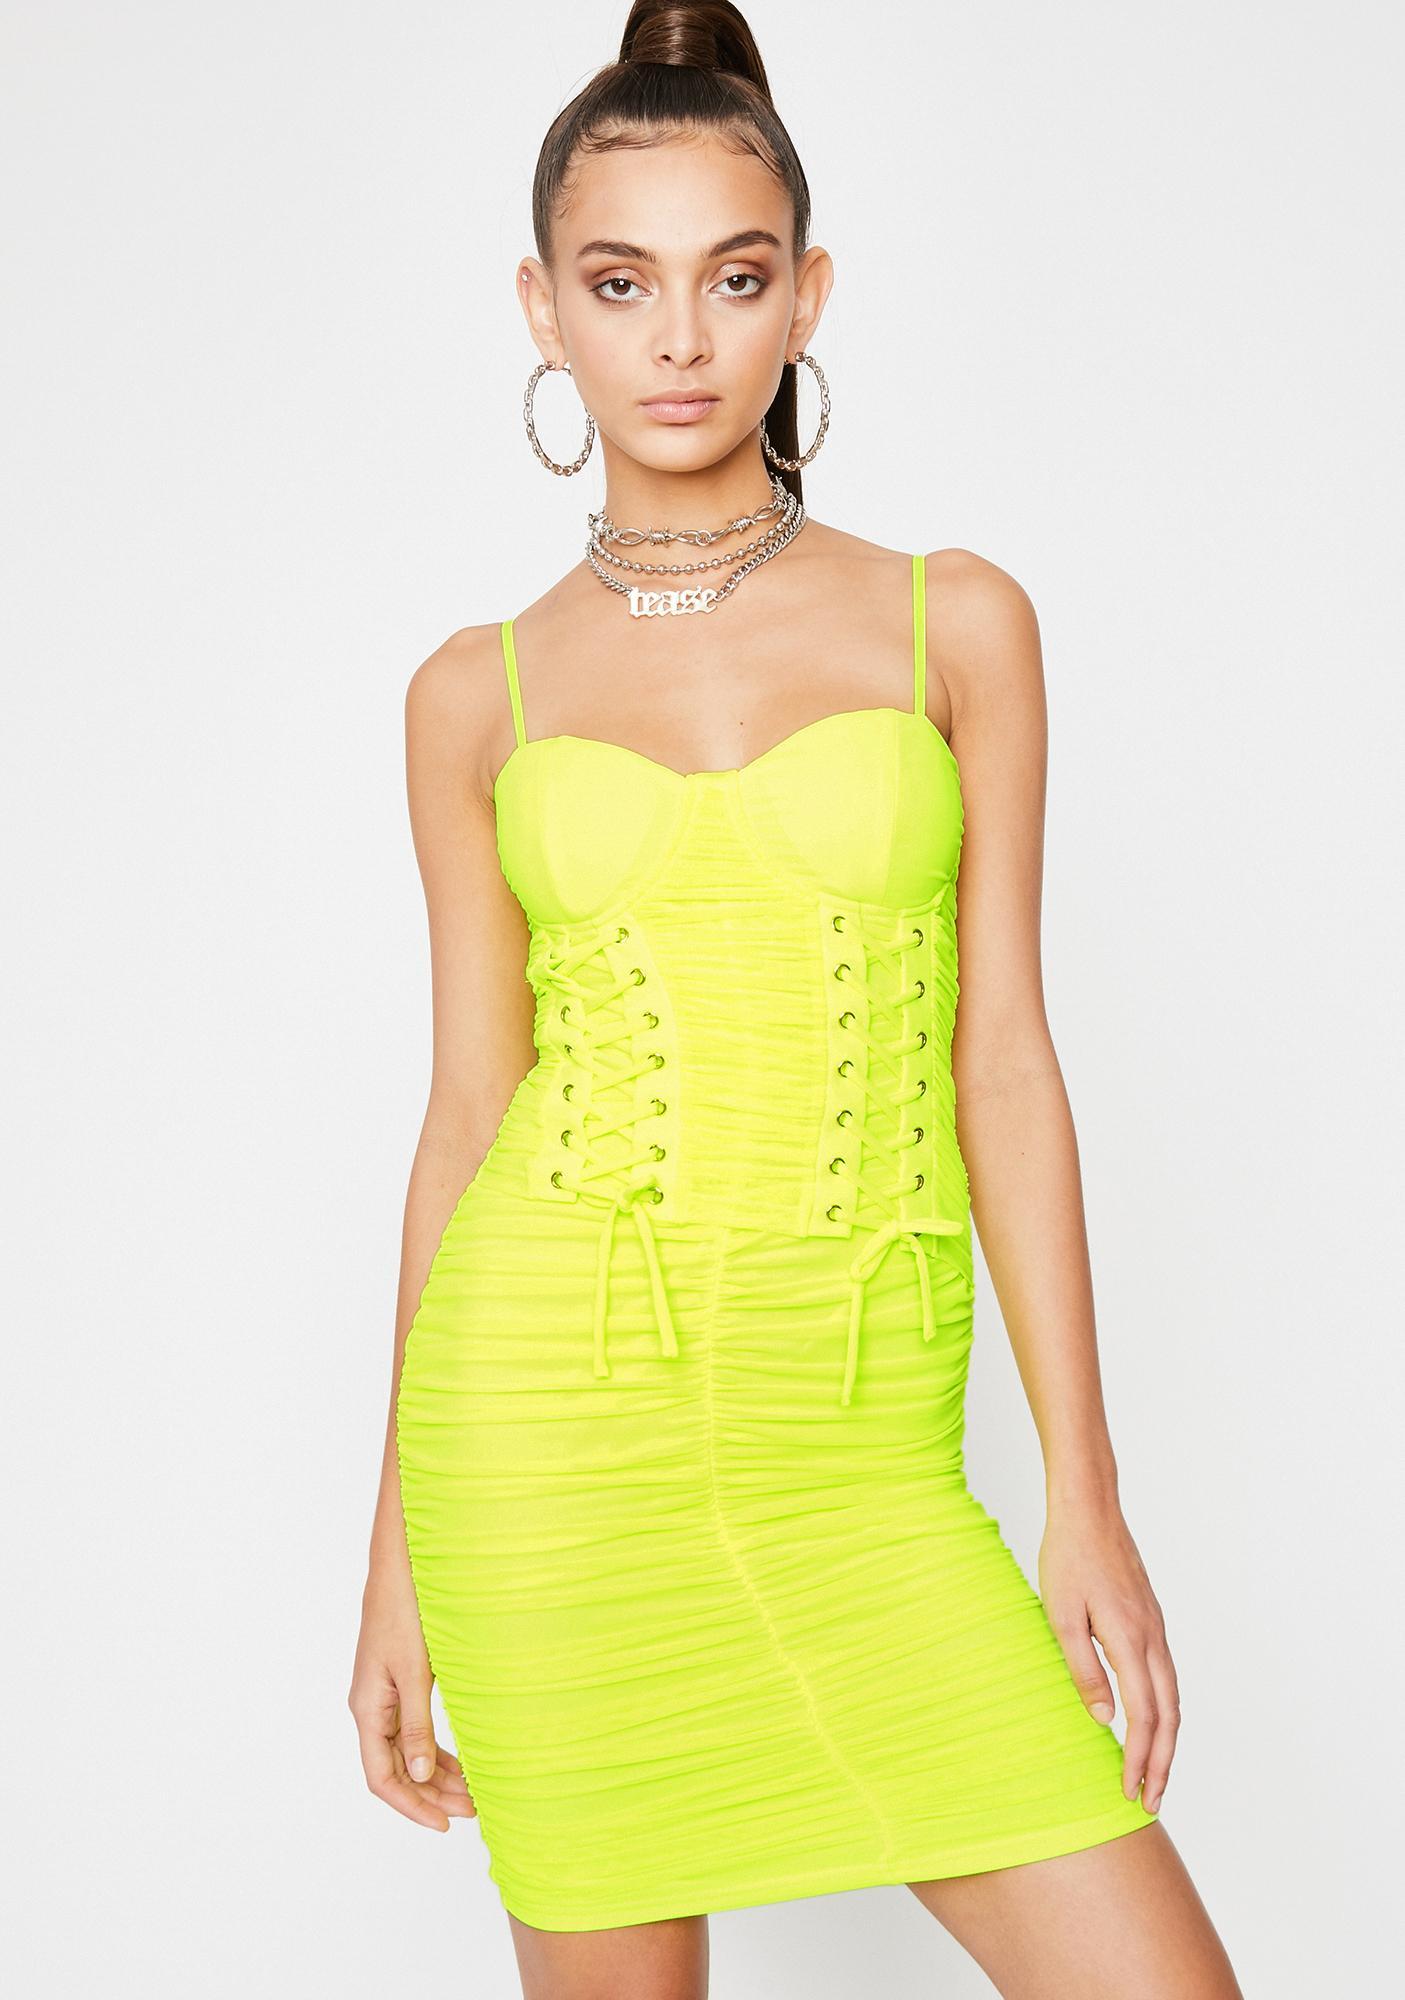 Vivid Lovely Soiree Corset Dress